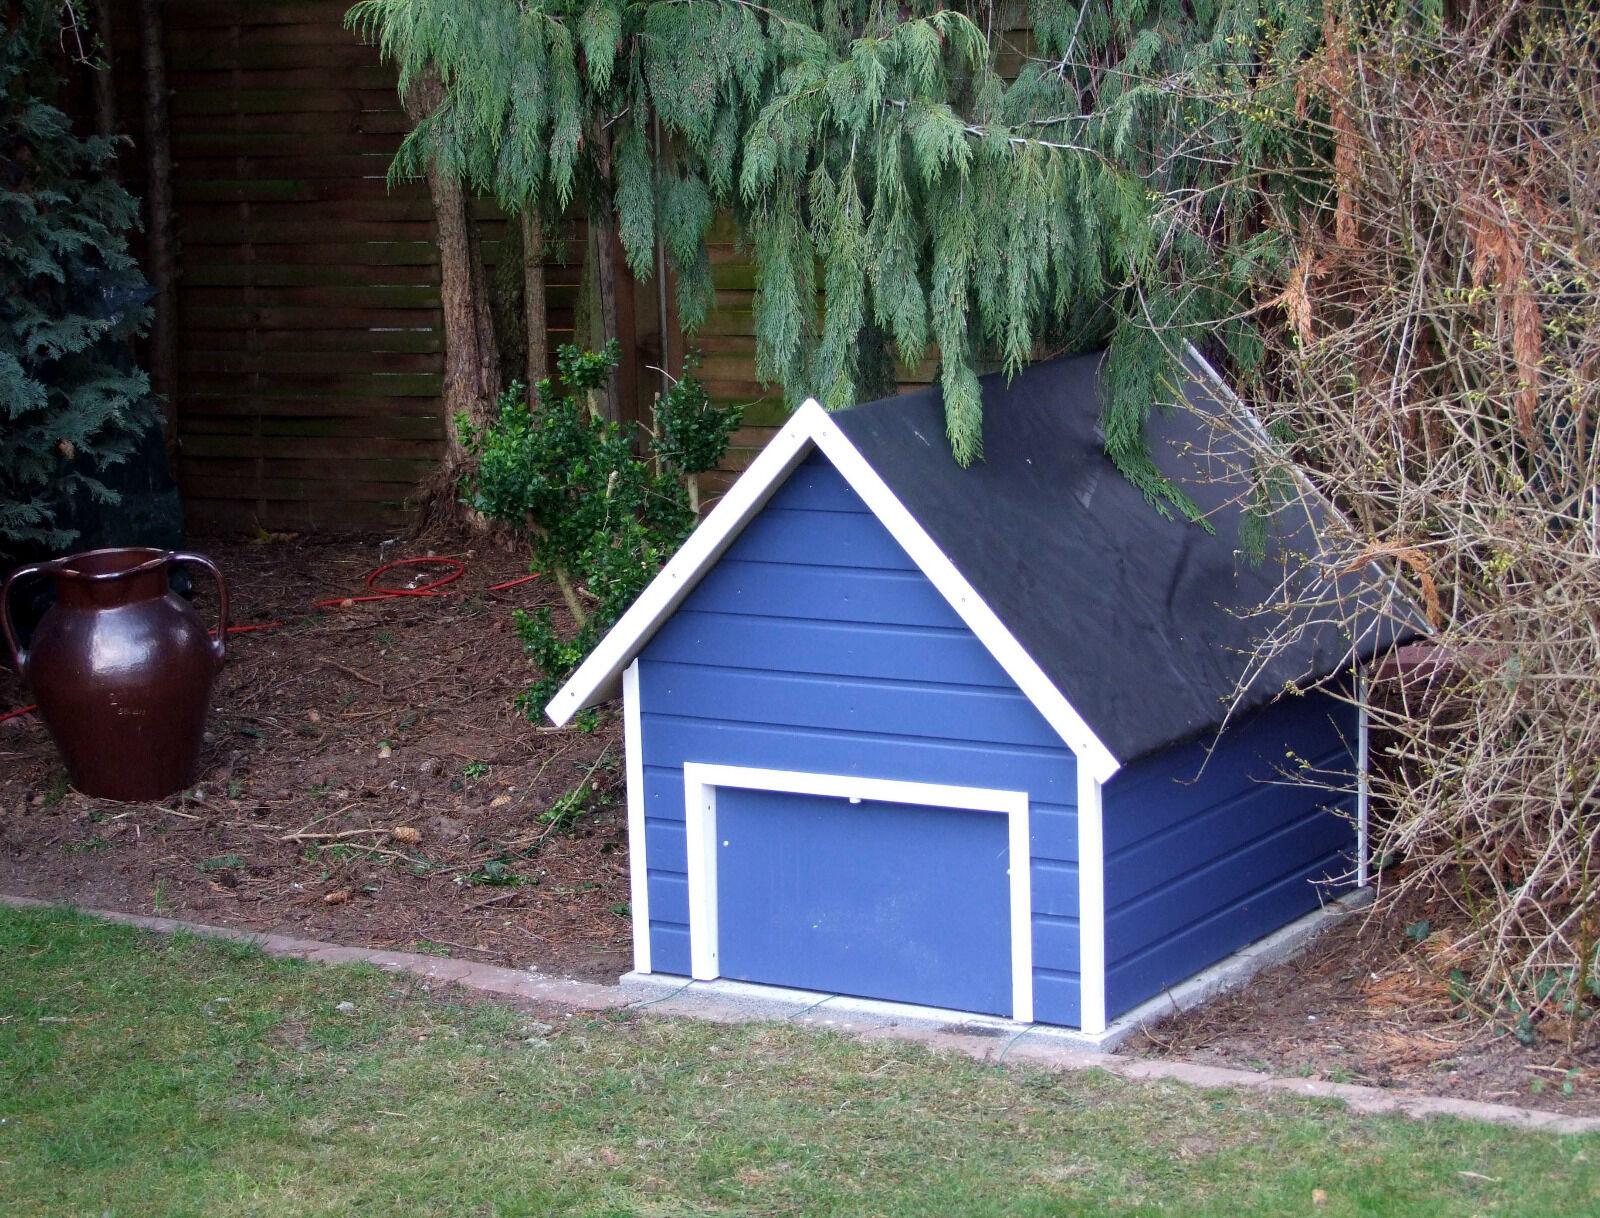 garage f r m hroboter mit automatischer klappe bauplan eur 10 00 picclick be. Black Bedroom Furniture Sets. Home Design Ideas